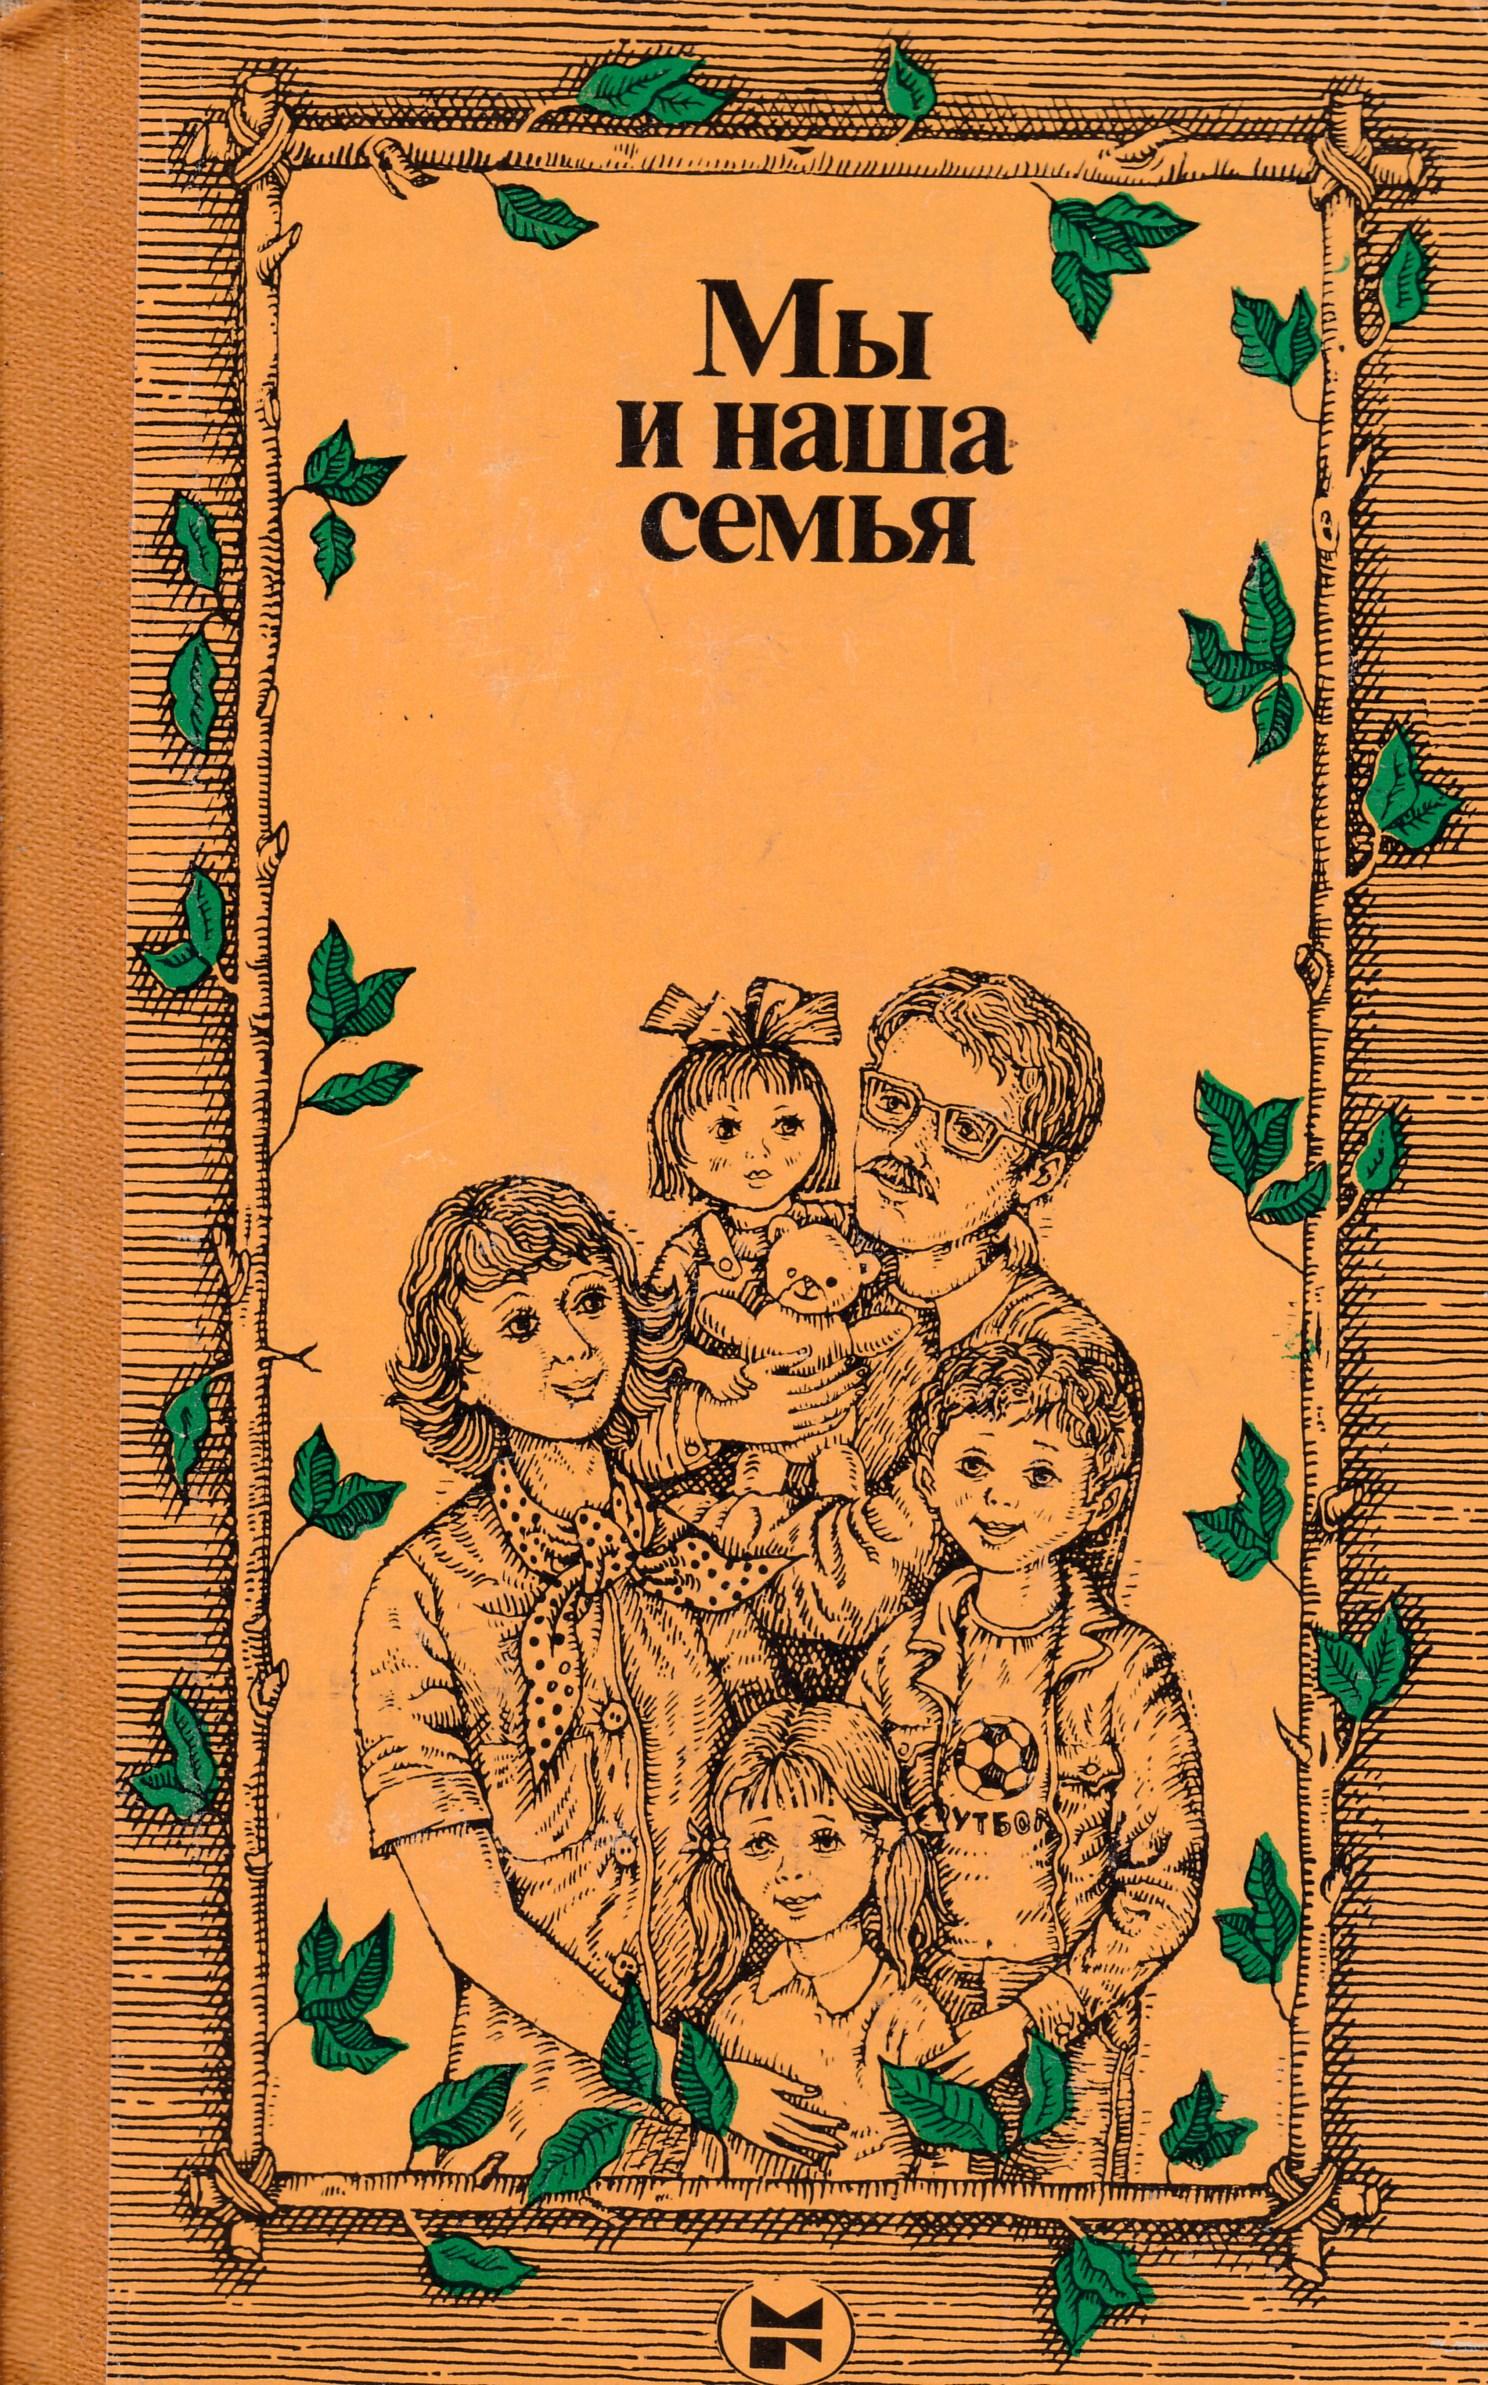 Картинки из книг о семье